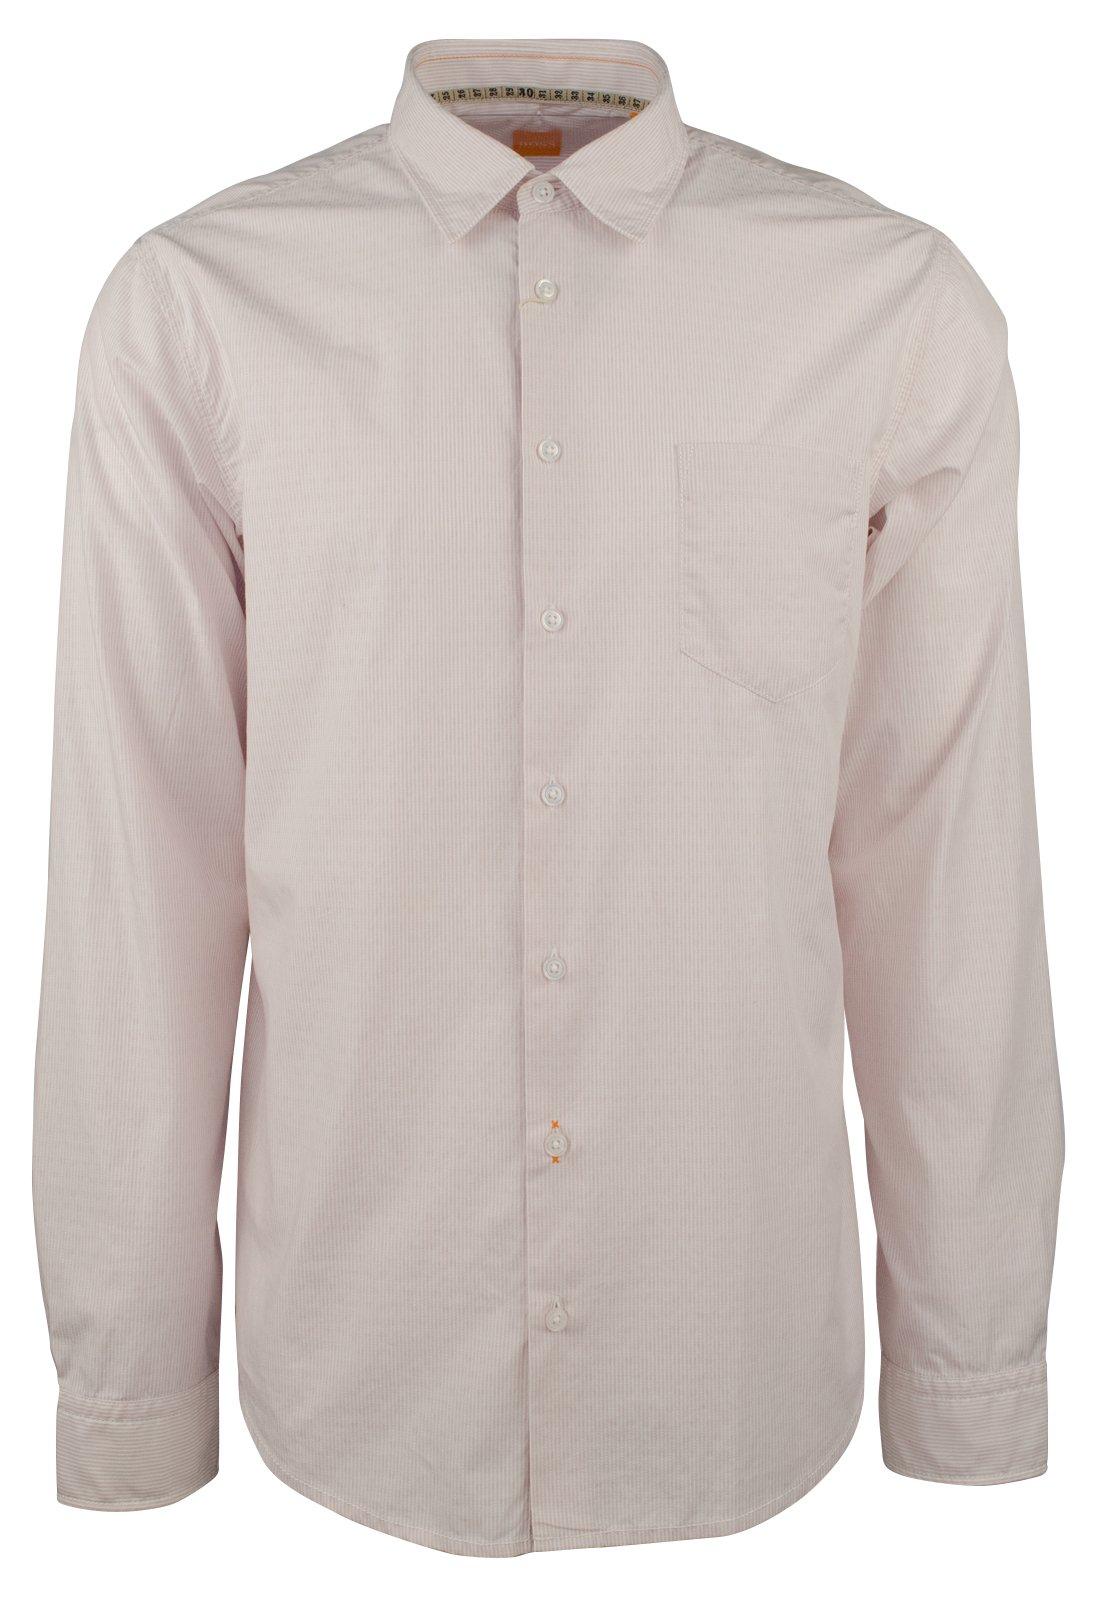 Hugo Boss Men's Orange Label EnameE Slim Fit Striped Shirt-PW-XXL